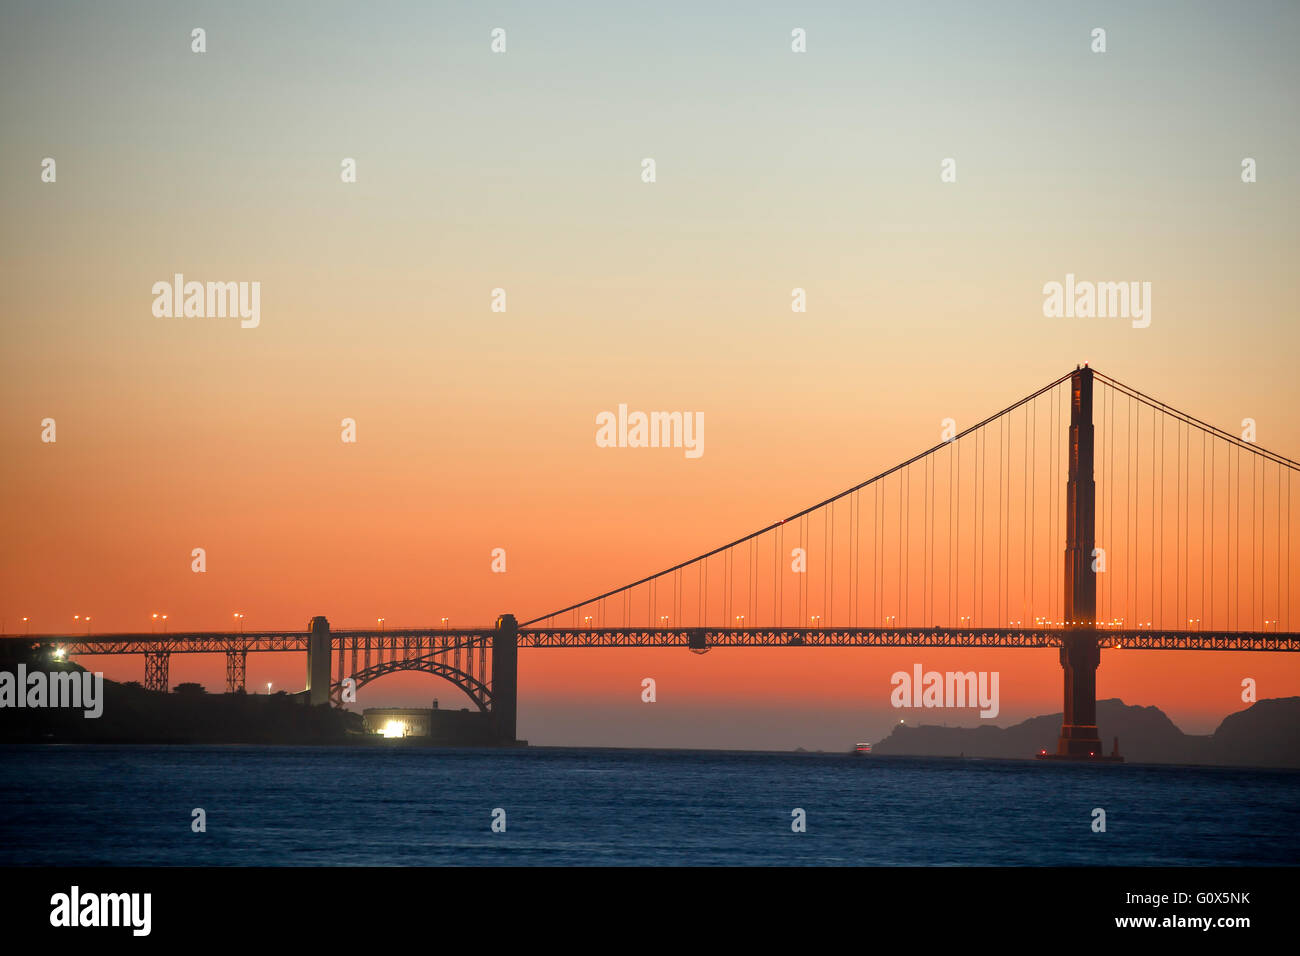 Golden Gate Bridge, San Francisco, California USA - Stock Image